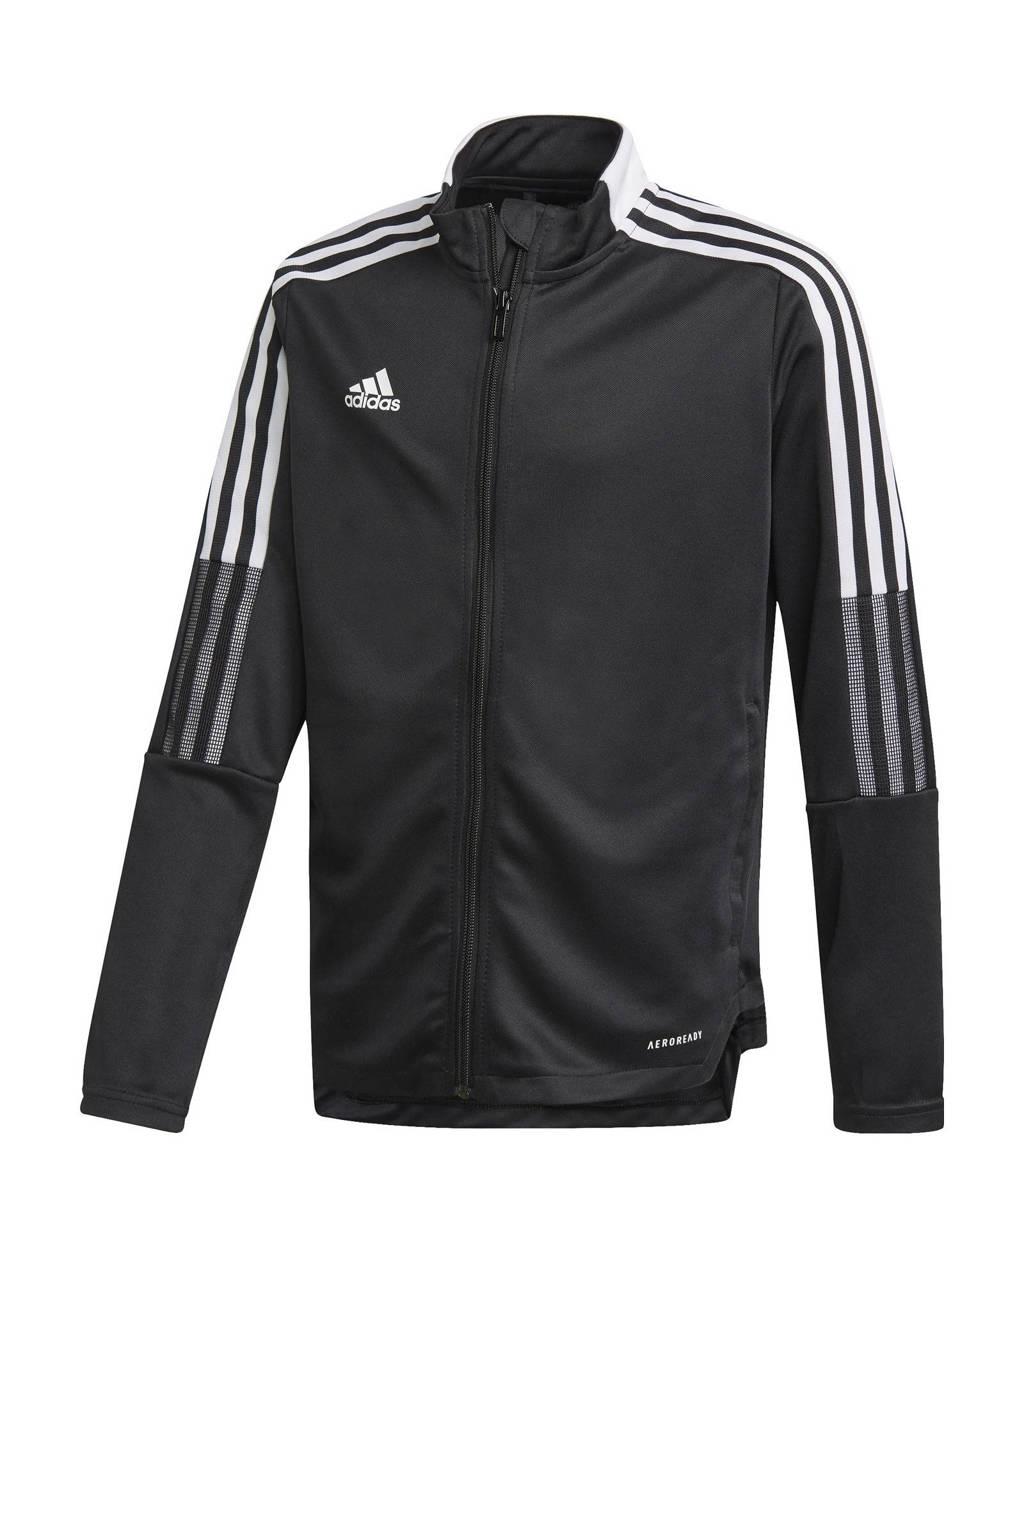 adidas Performance   Tiro 21 voetbalvest zwart, Zwart